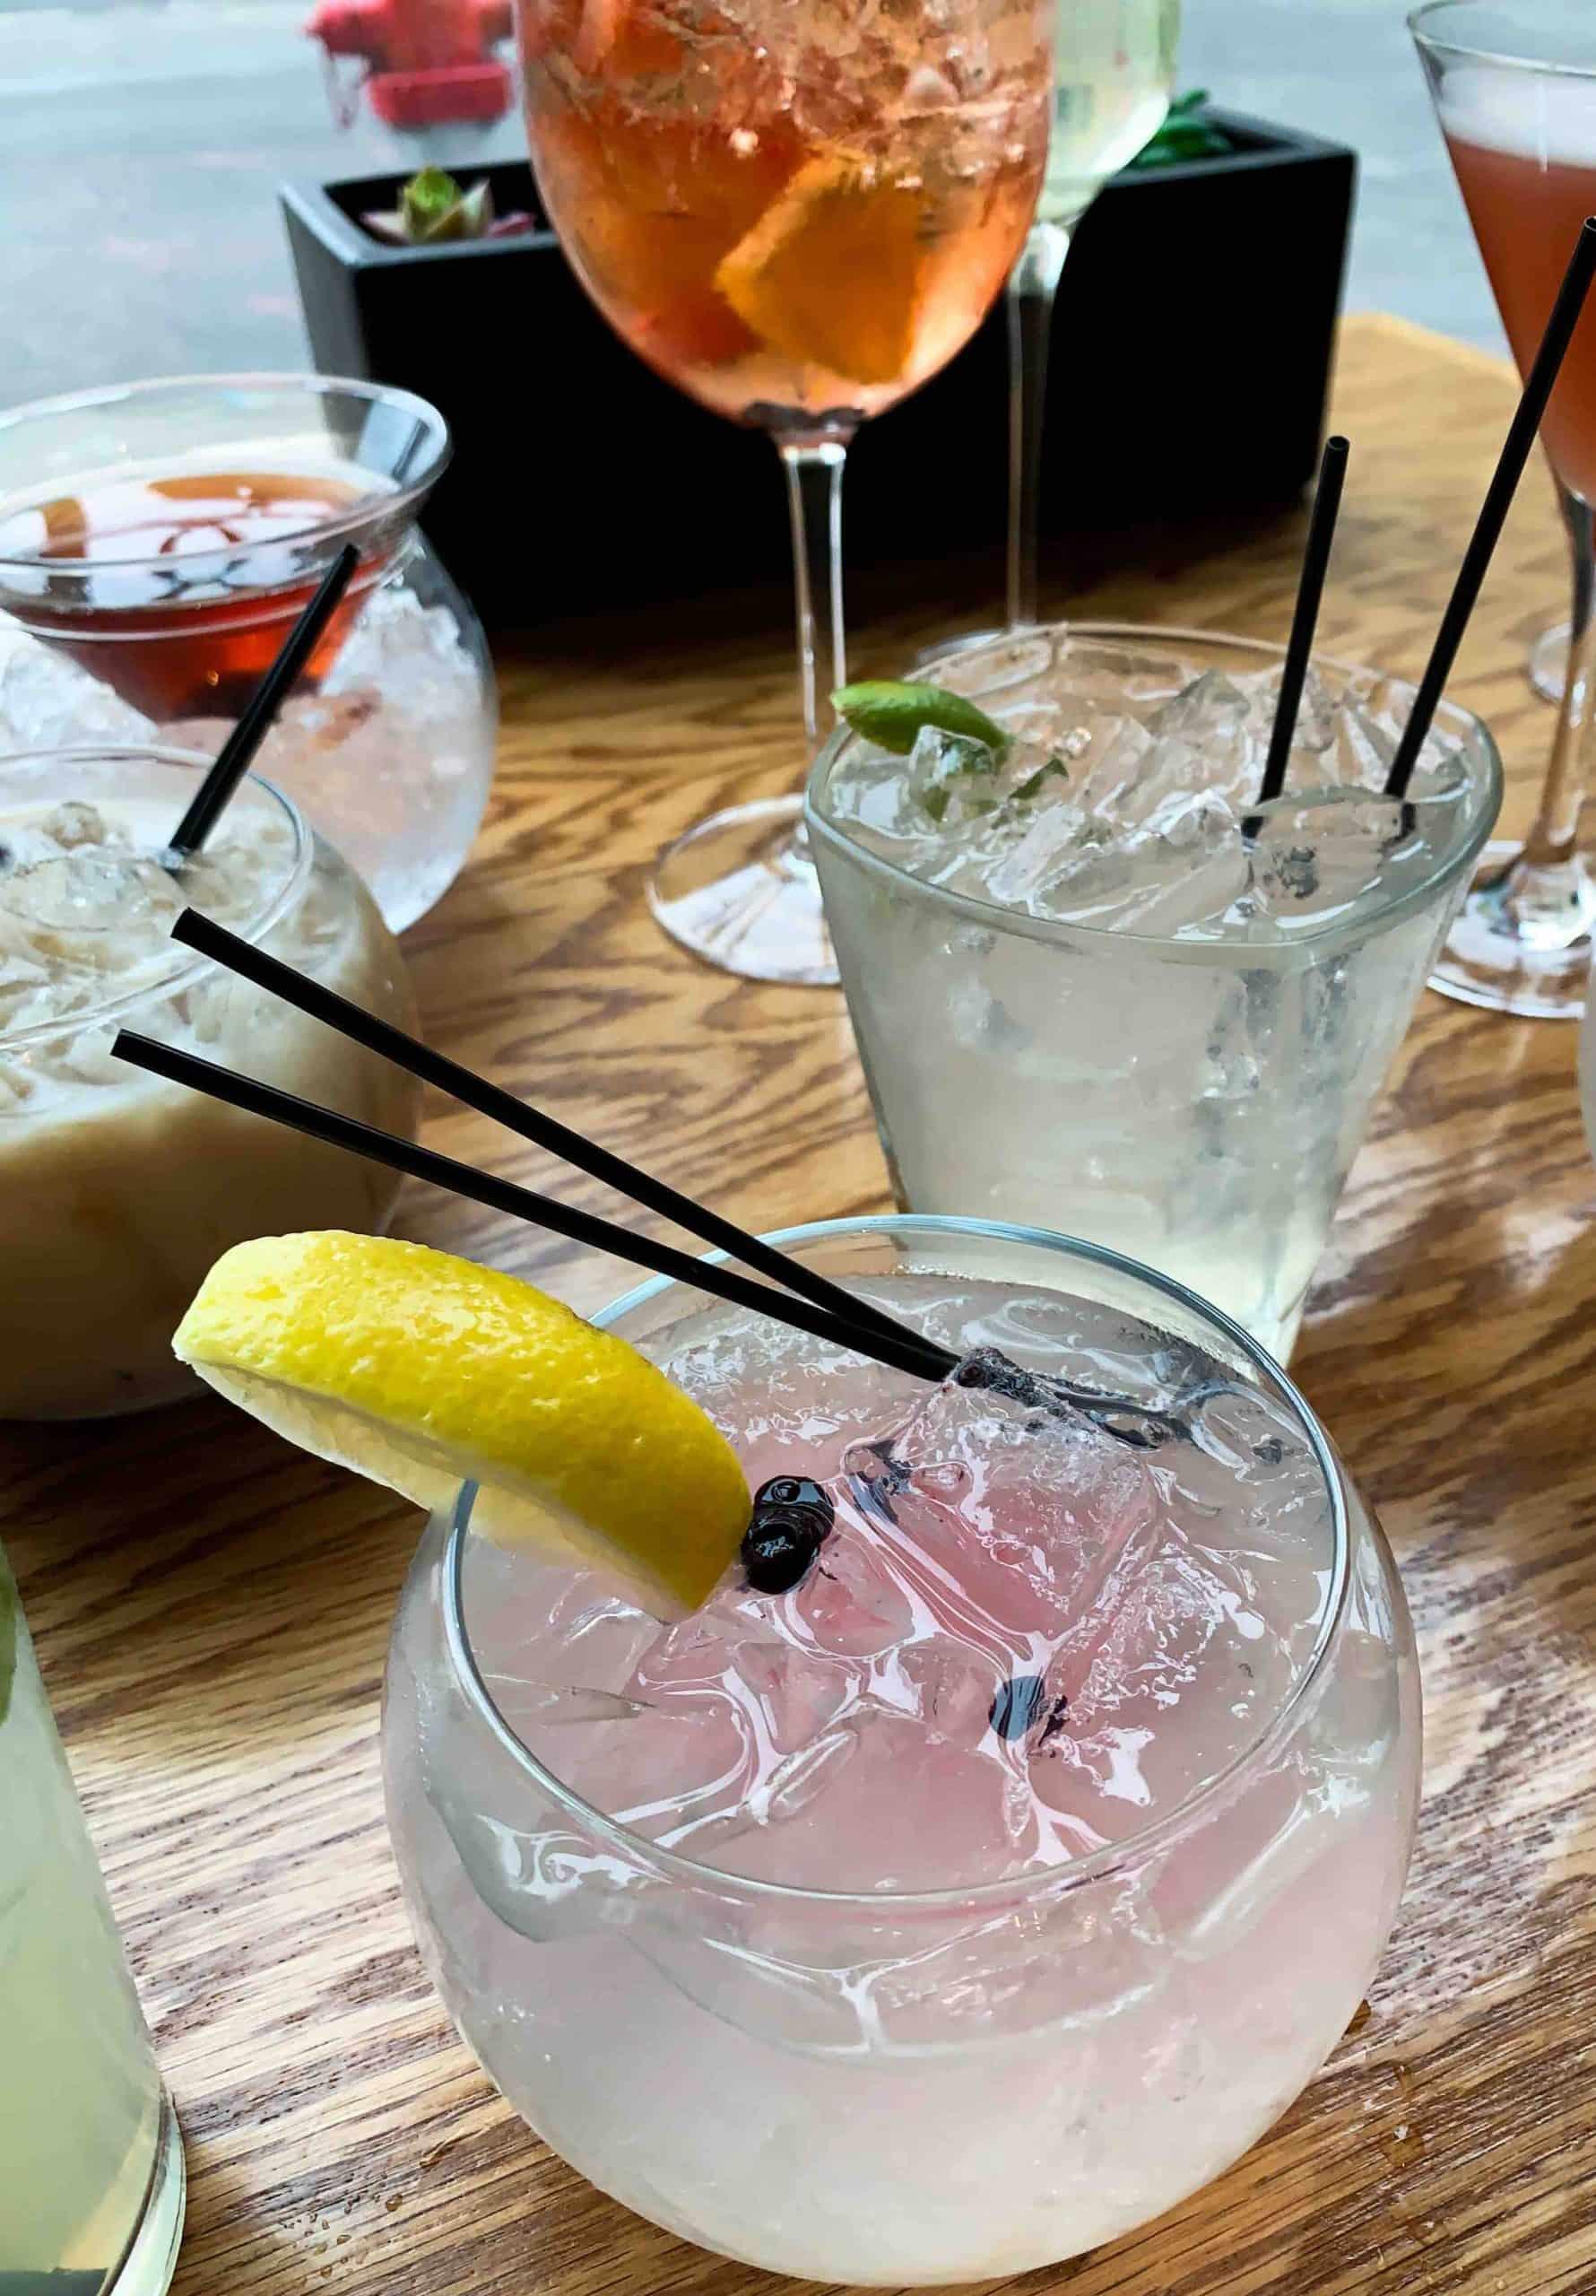 Restaurants in Spokane Offering Pre-Made Cocktails To Go